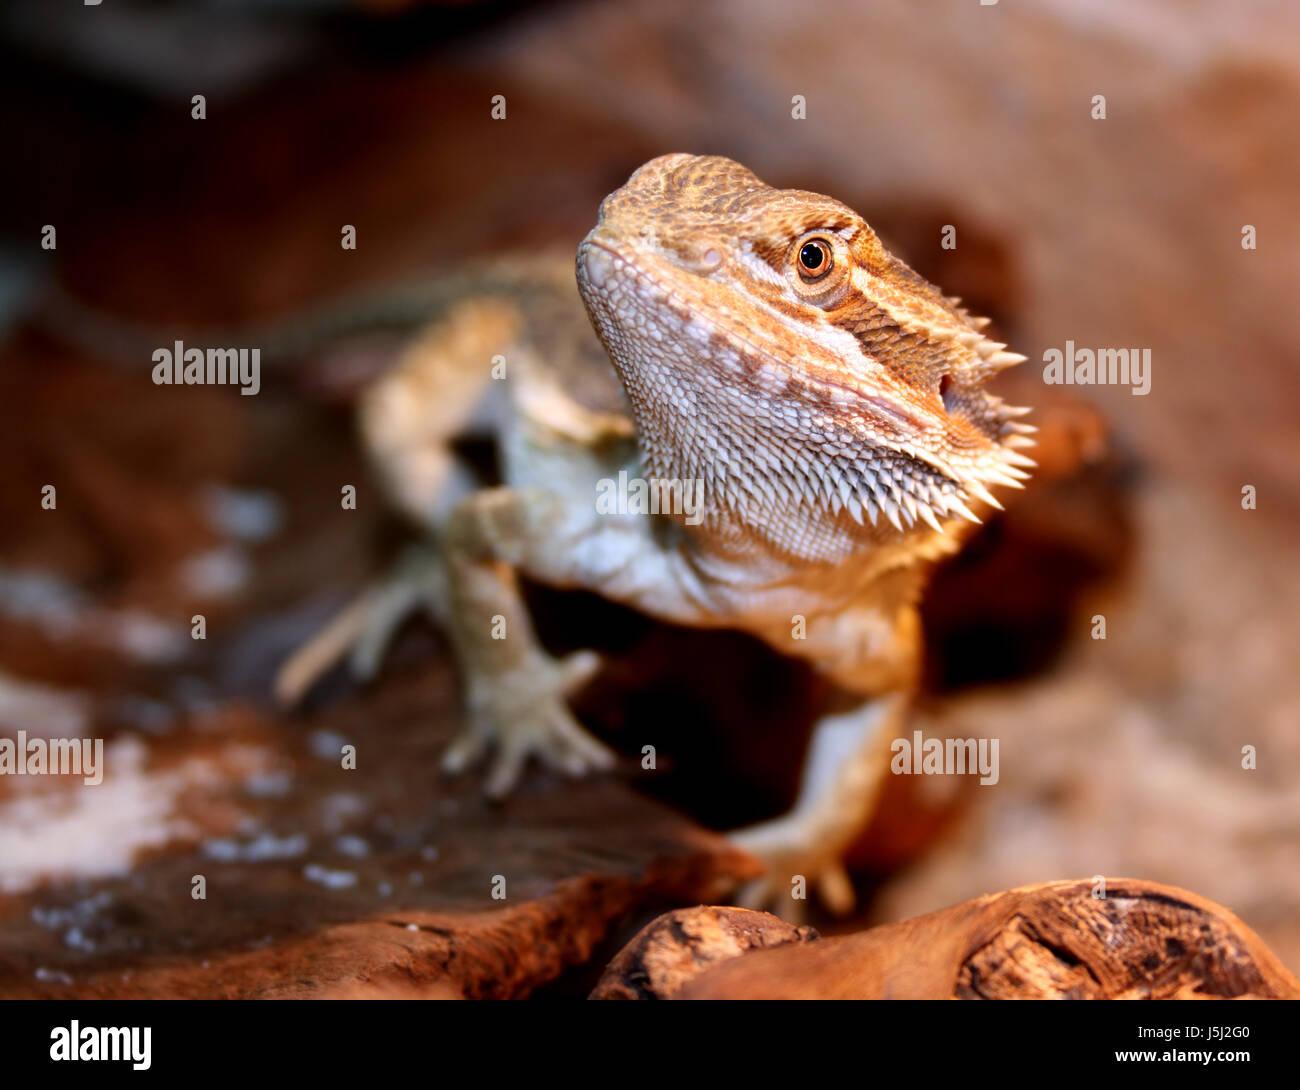 Desert Wasteland Pet Reptile Australia Prickle Hovel Heat Terrarium